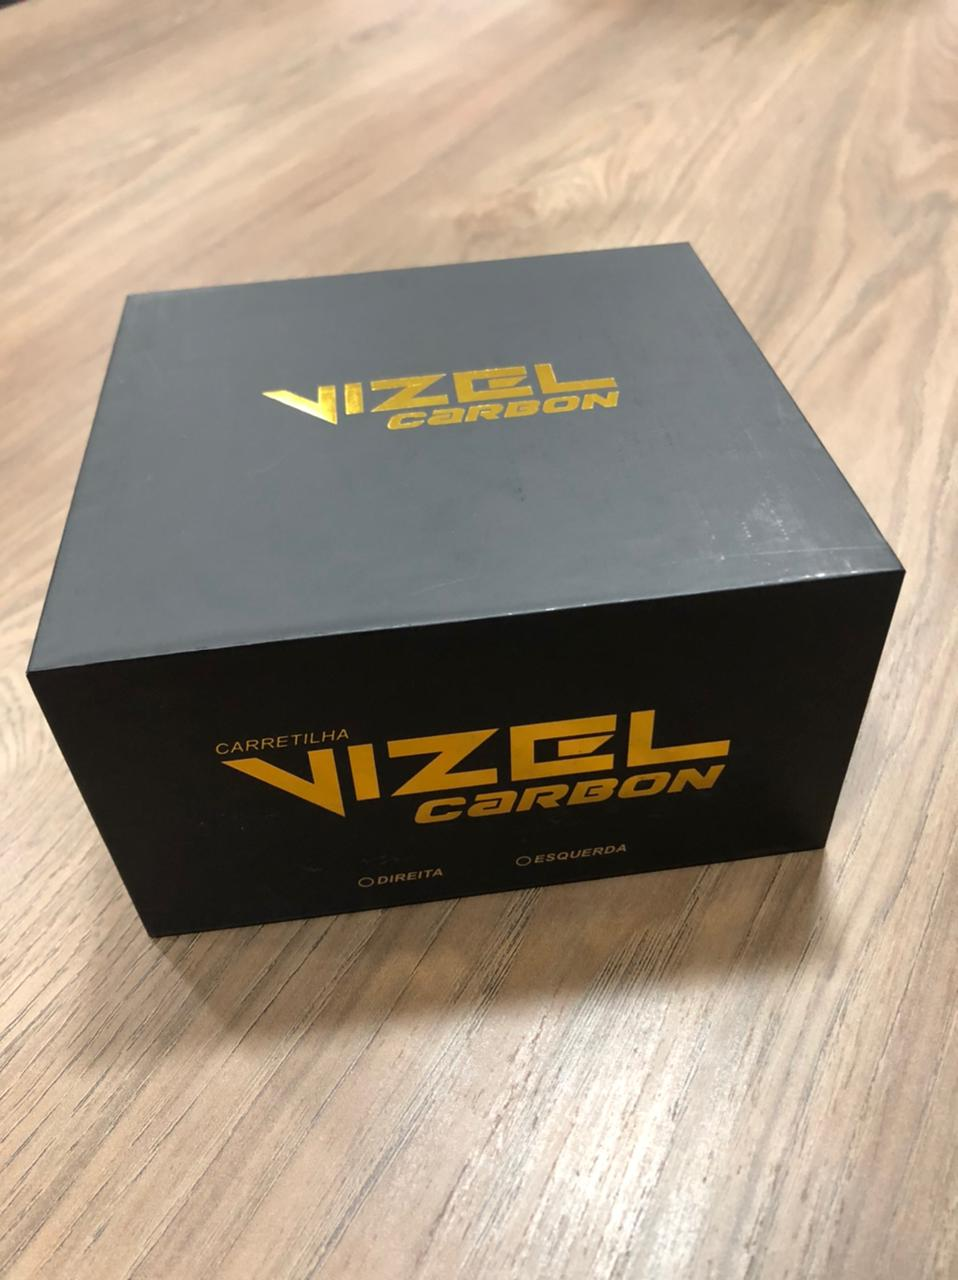 Carretilha Saint Vizel Carbon 12000 Rec 8.1:1 Drag 8kg  - Pesca Adventure